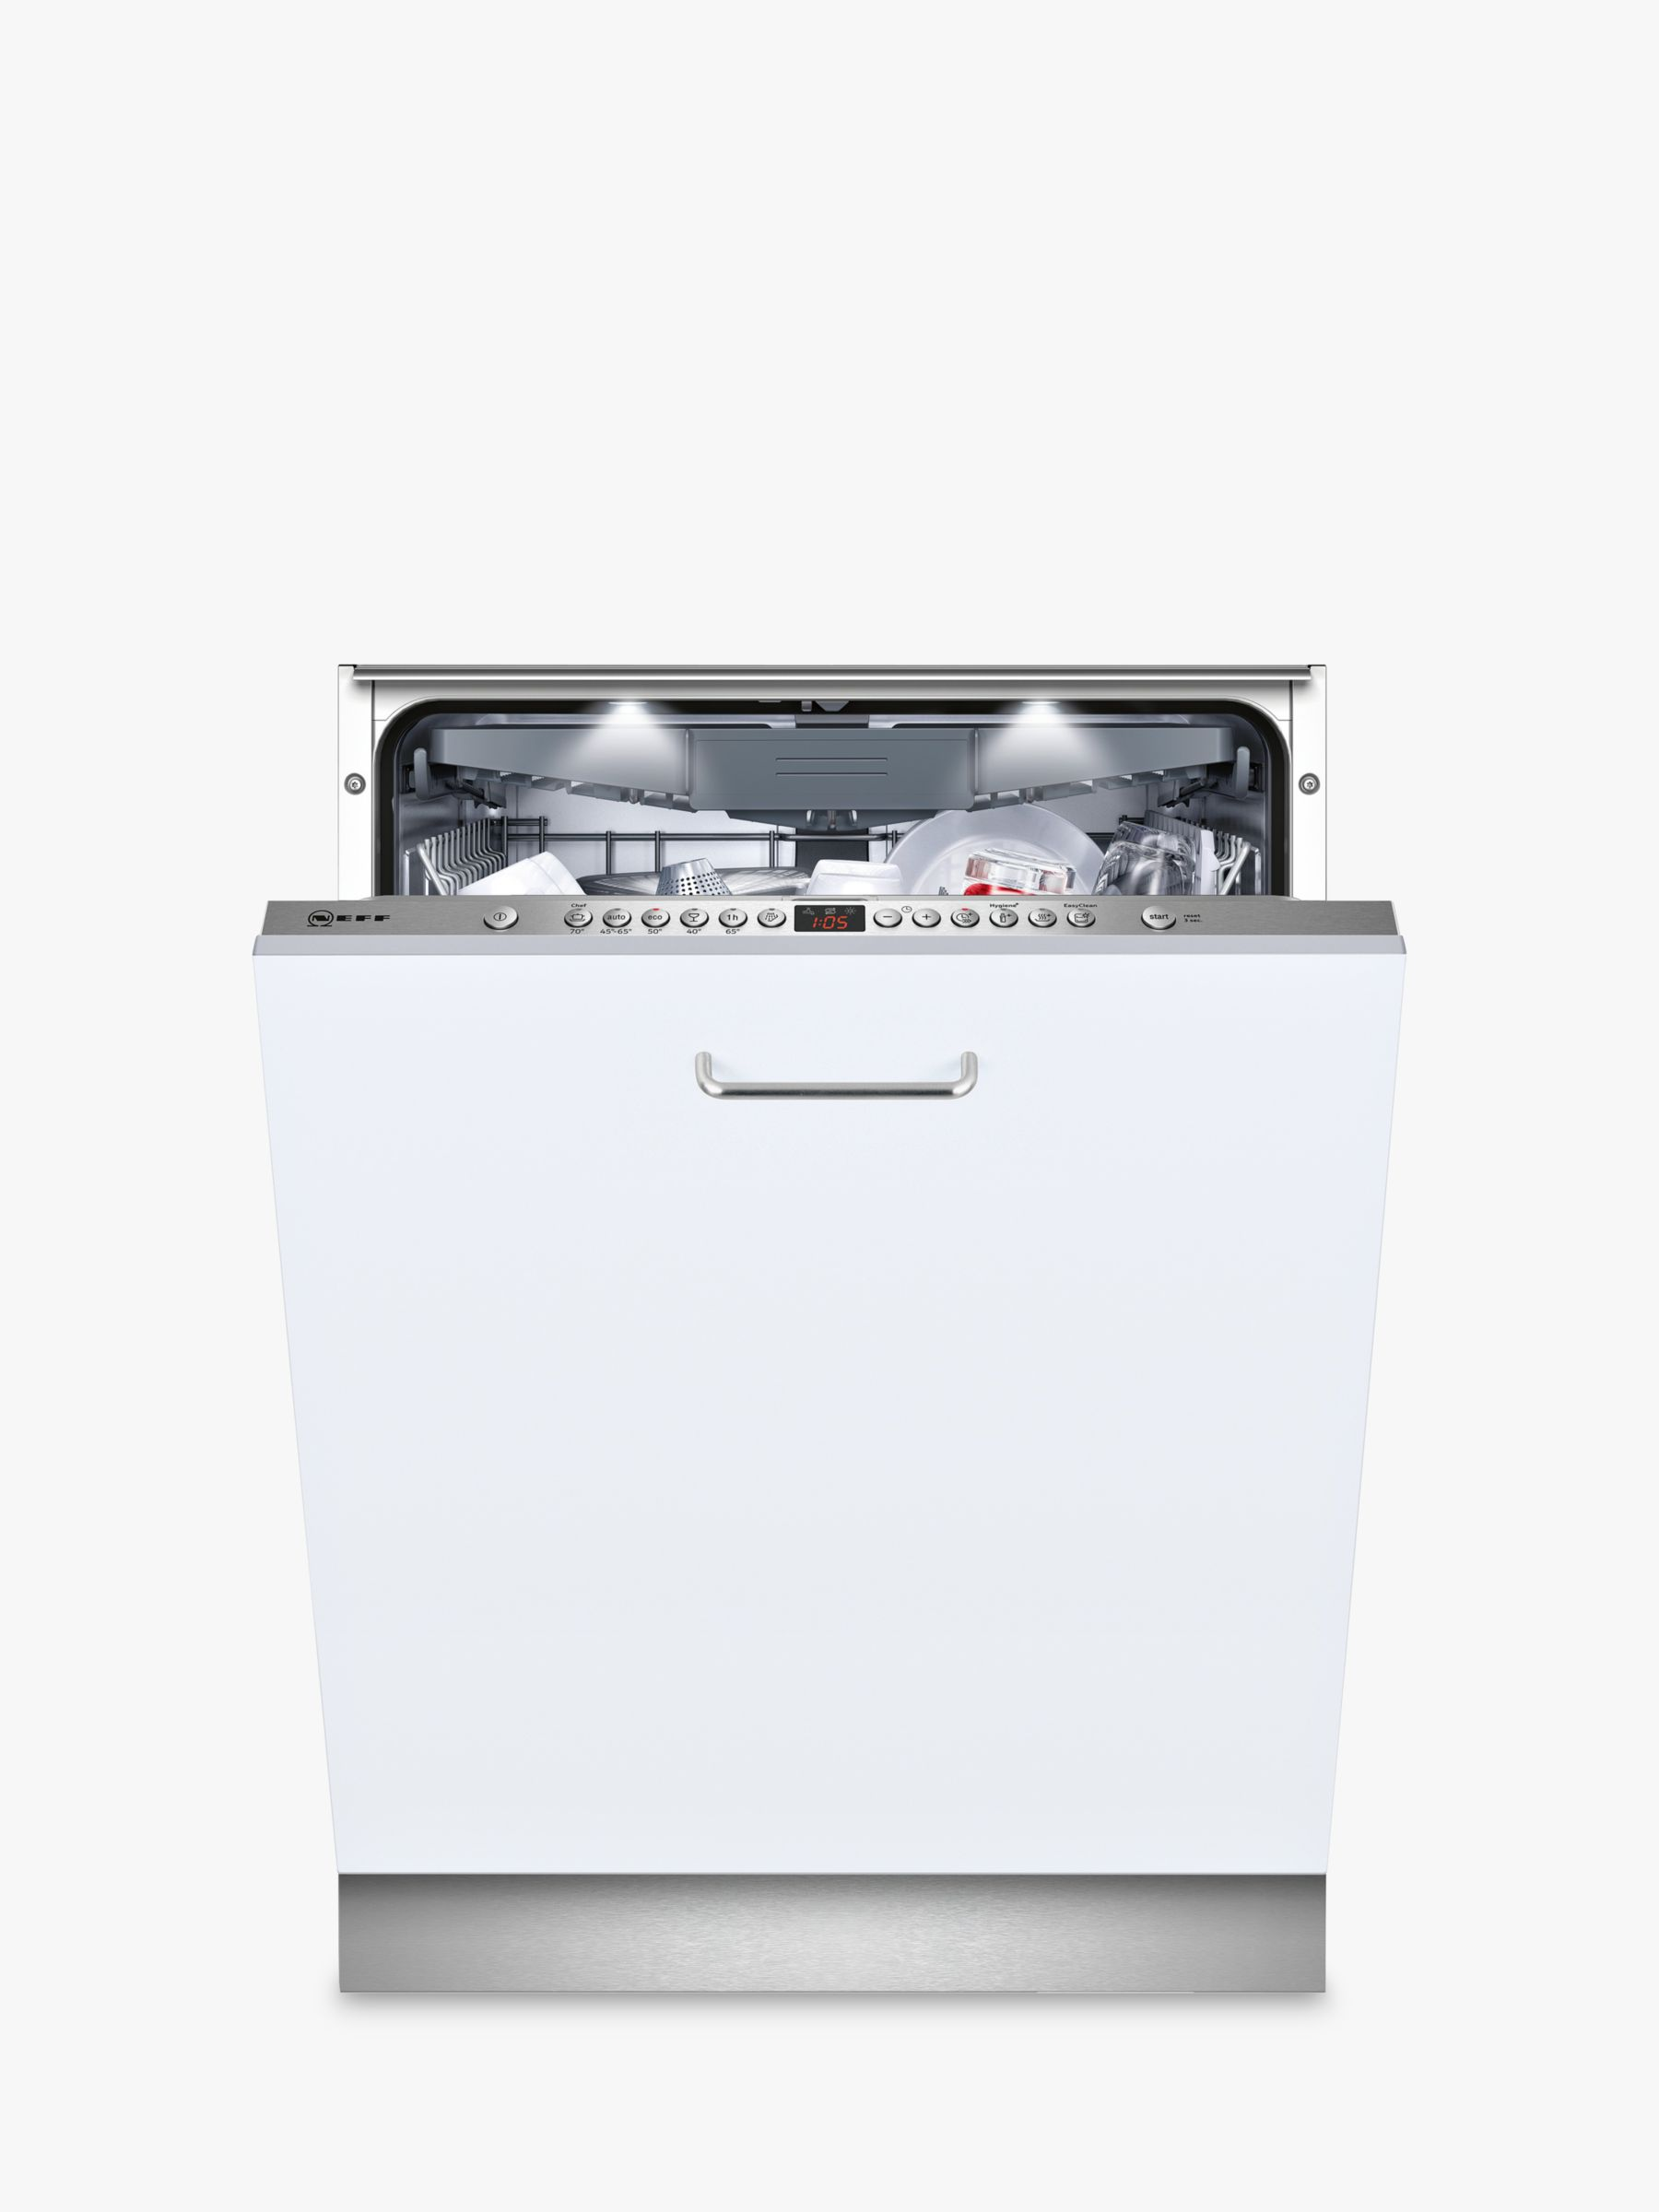 NEFF Neff S513M60X1G Integrated Dishwasher, Stainless Steel